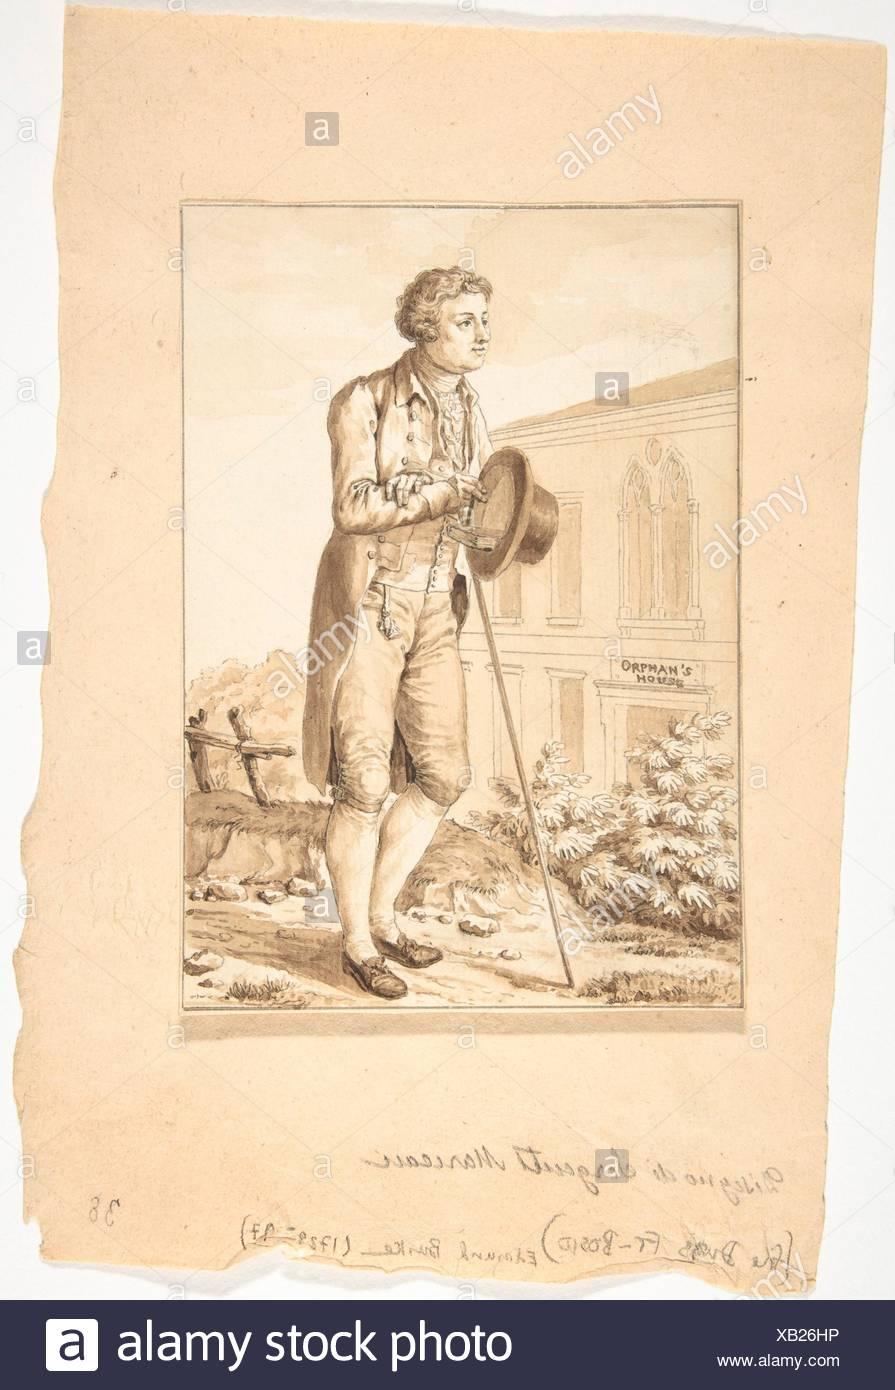 Retrato de Edmond Burke. Artista: Antoine Louis François Sergent Marceau (Francés, Chartres 1751-1847 Niza); niñera: Retrato del Honorable Imagen De Stock